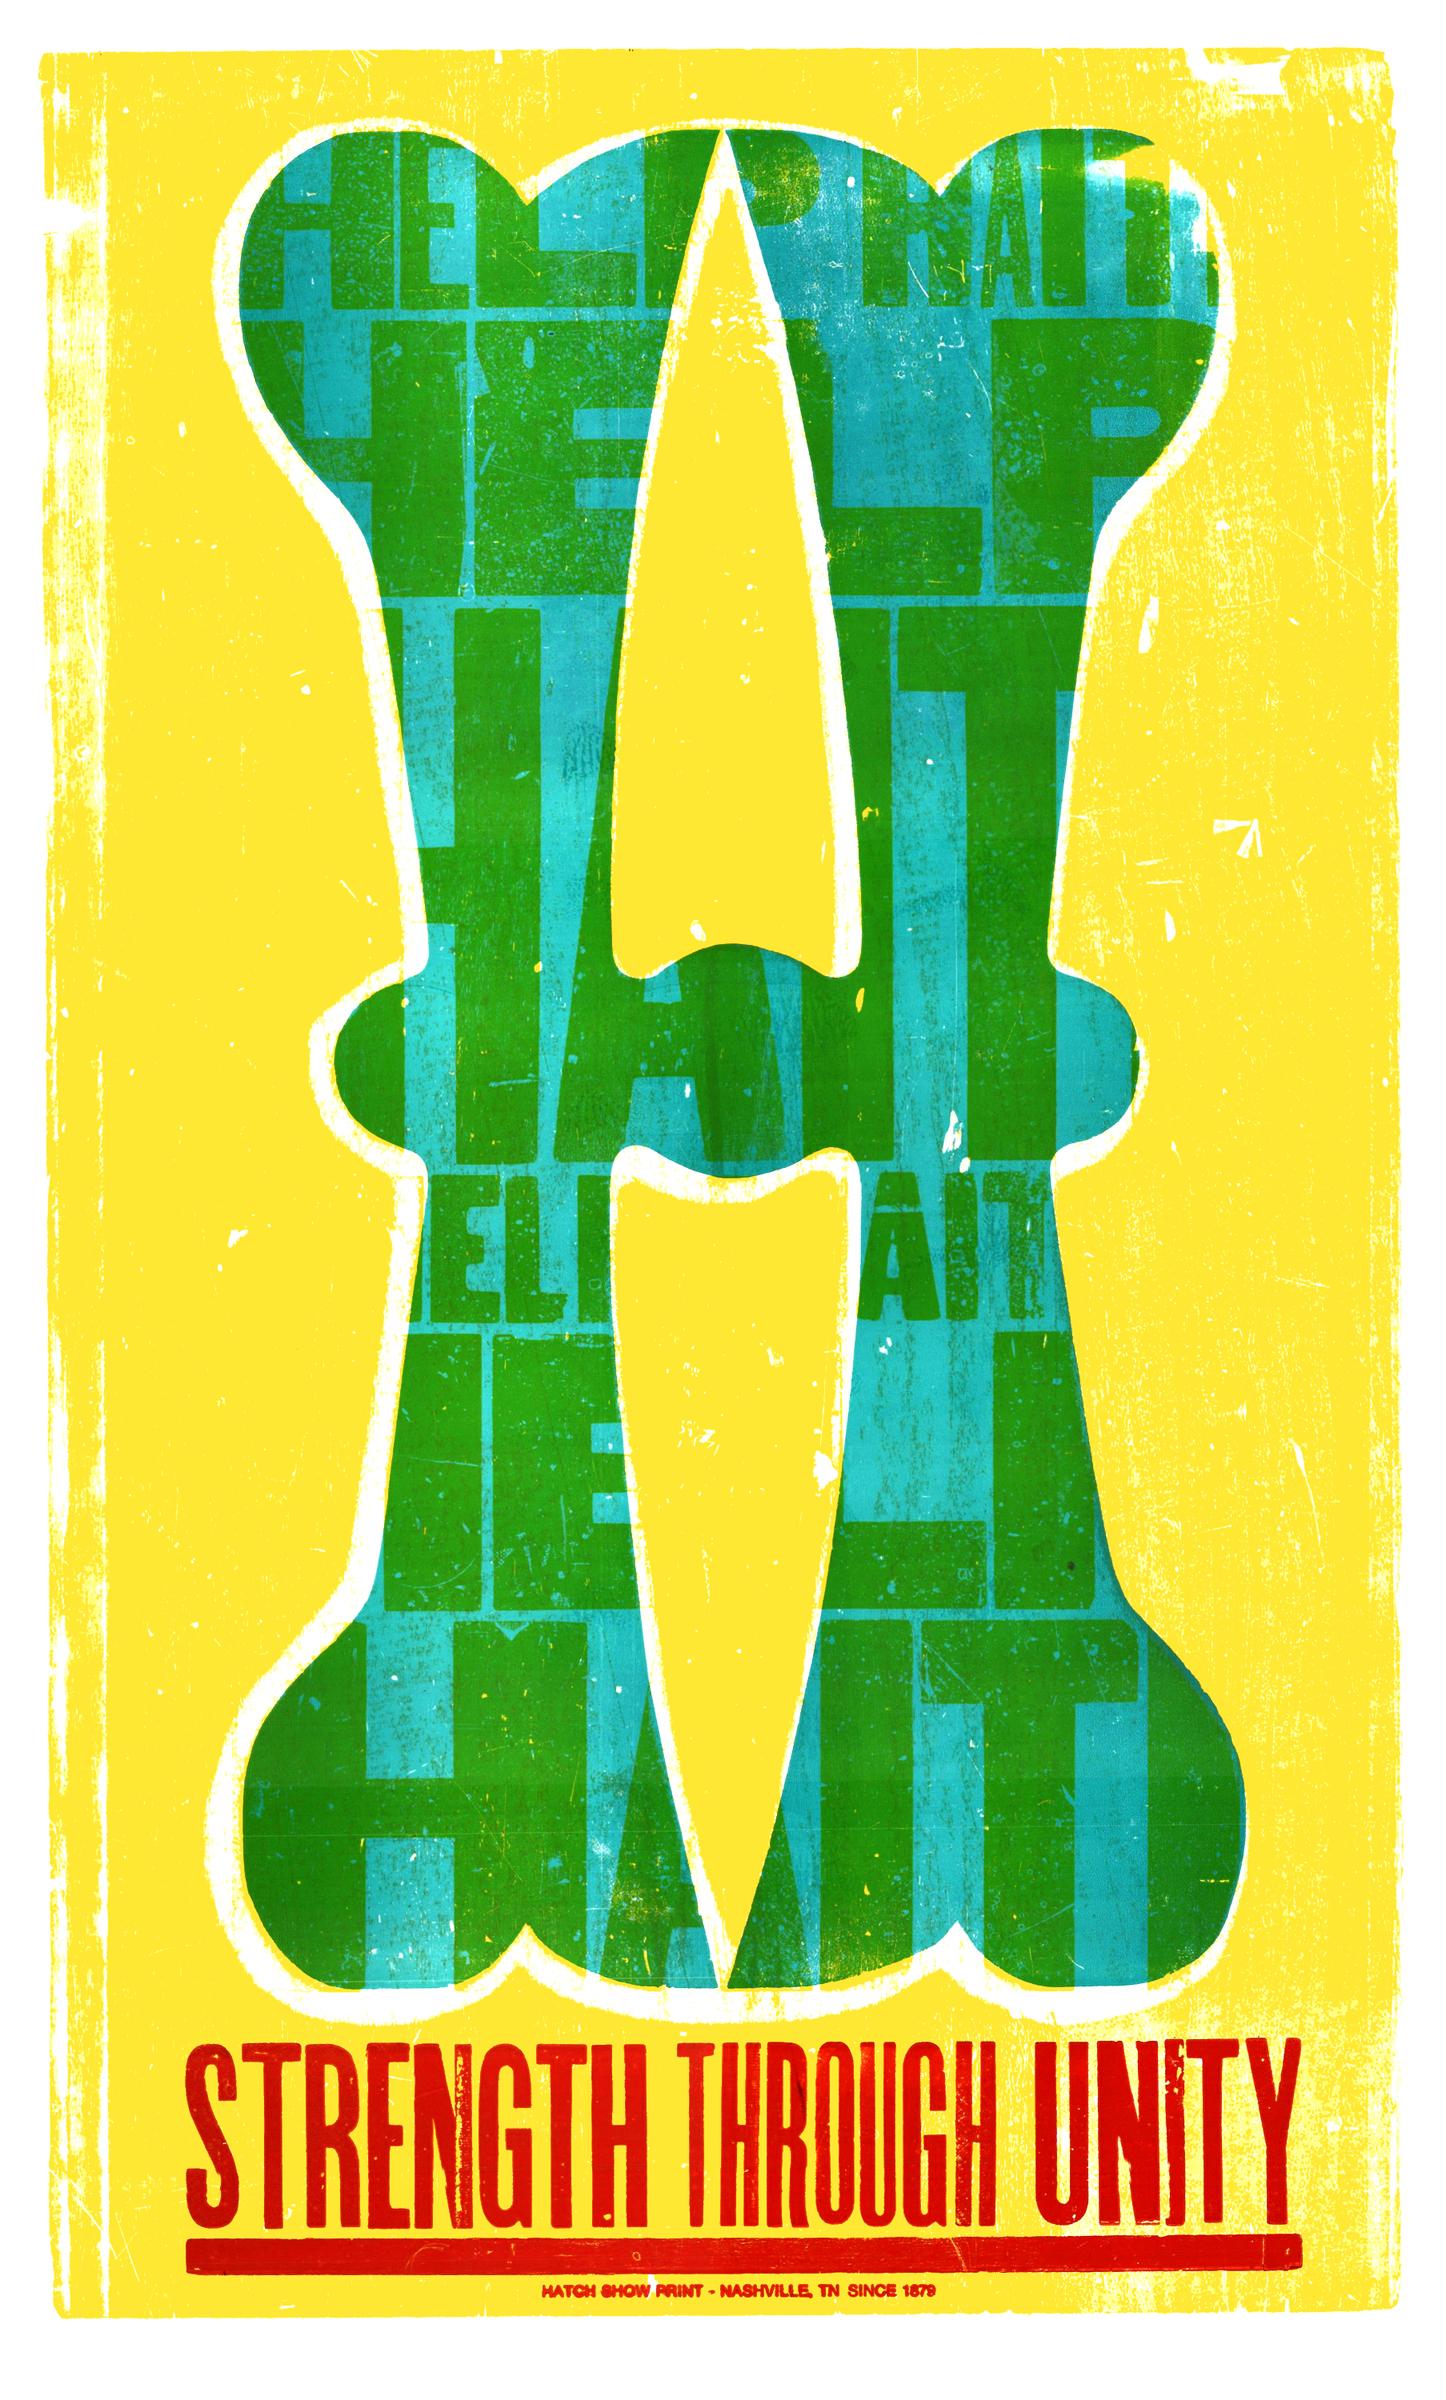 Haiti Poster Project, 4-color letterpress benefit poster, 2010